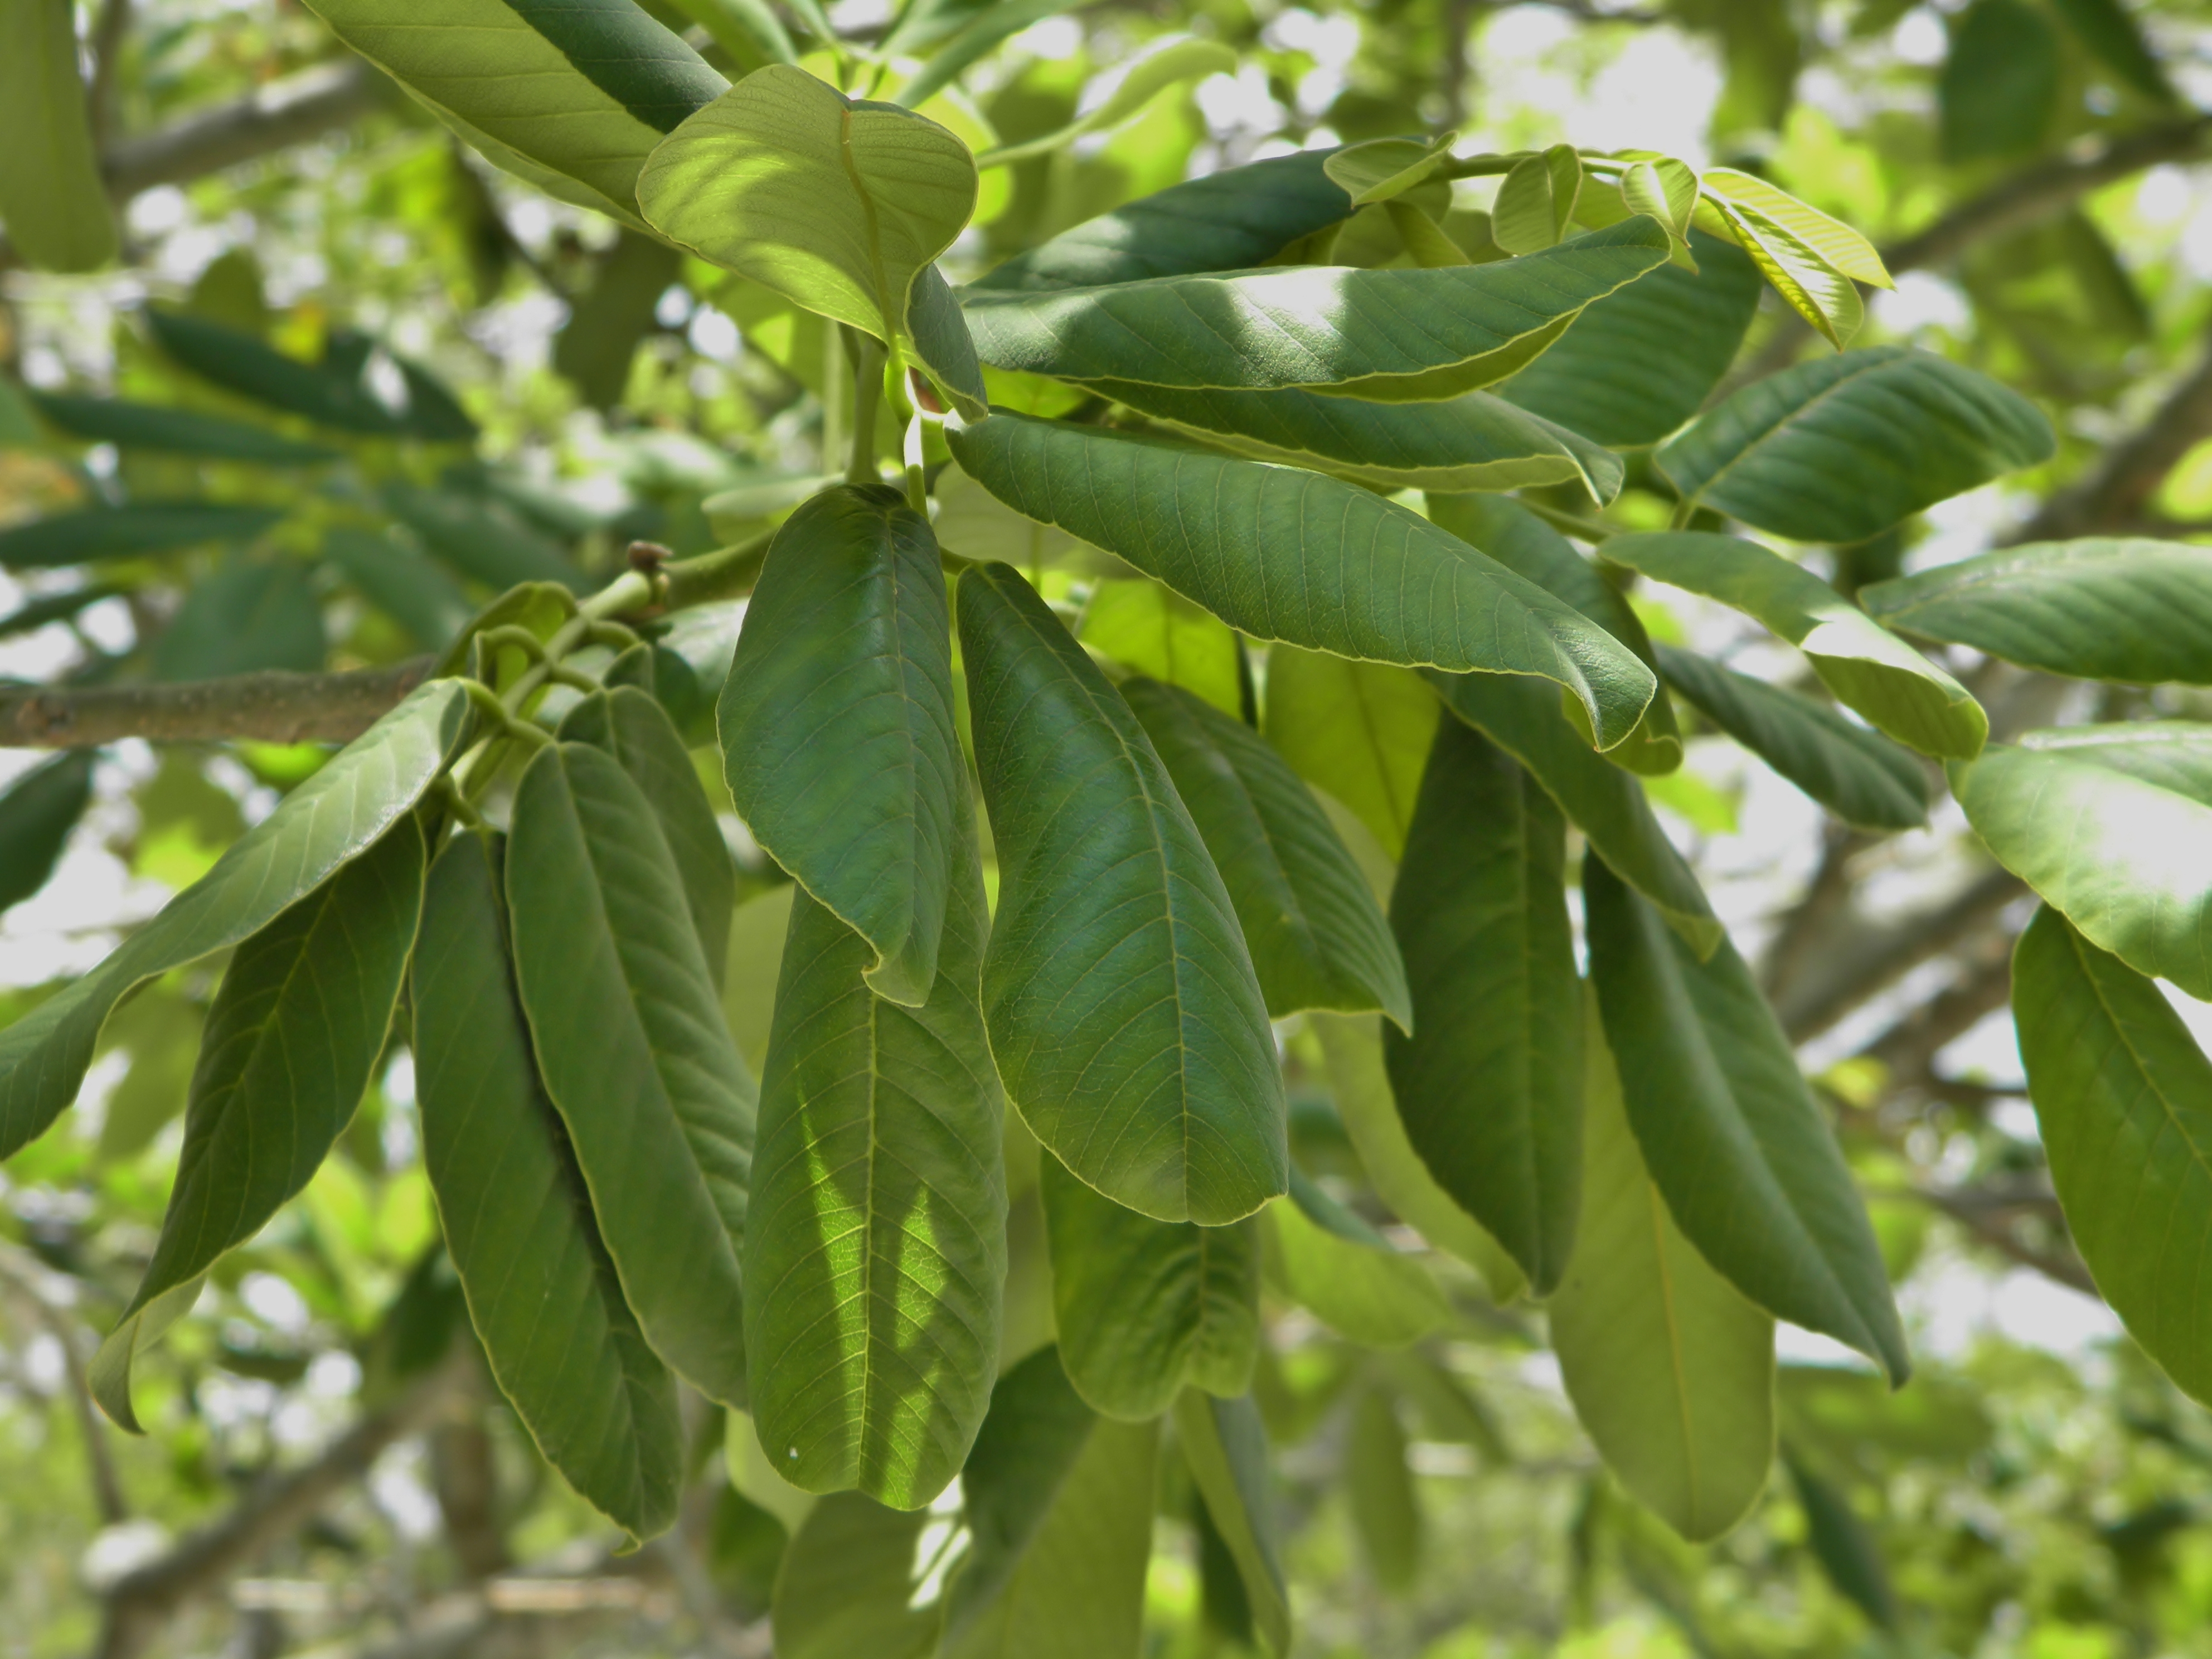 Image of Florida fishpoison tree